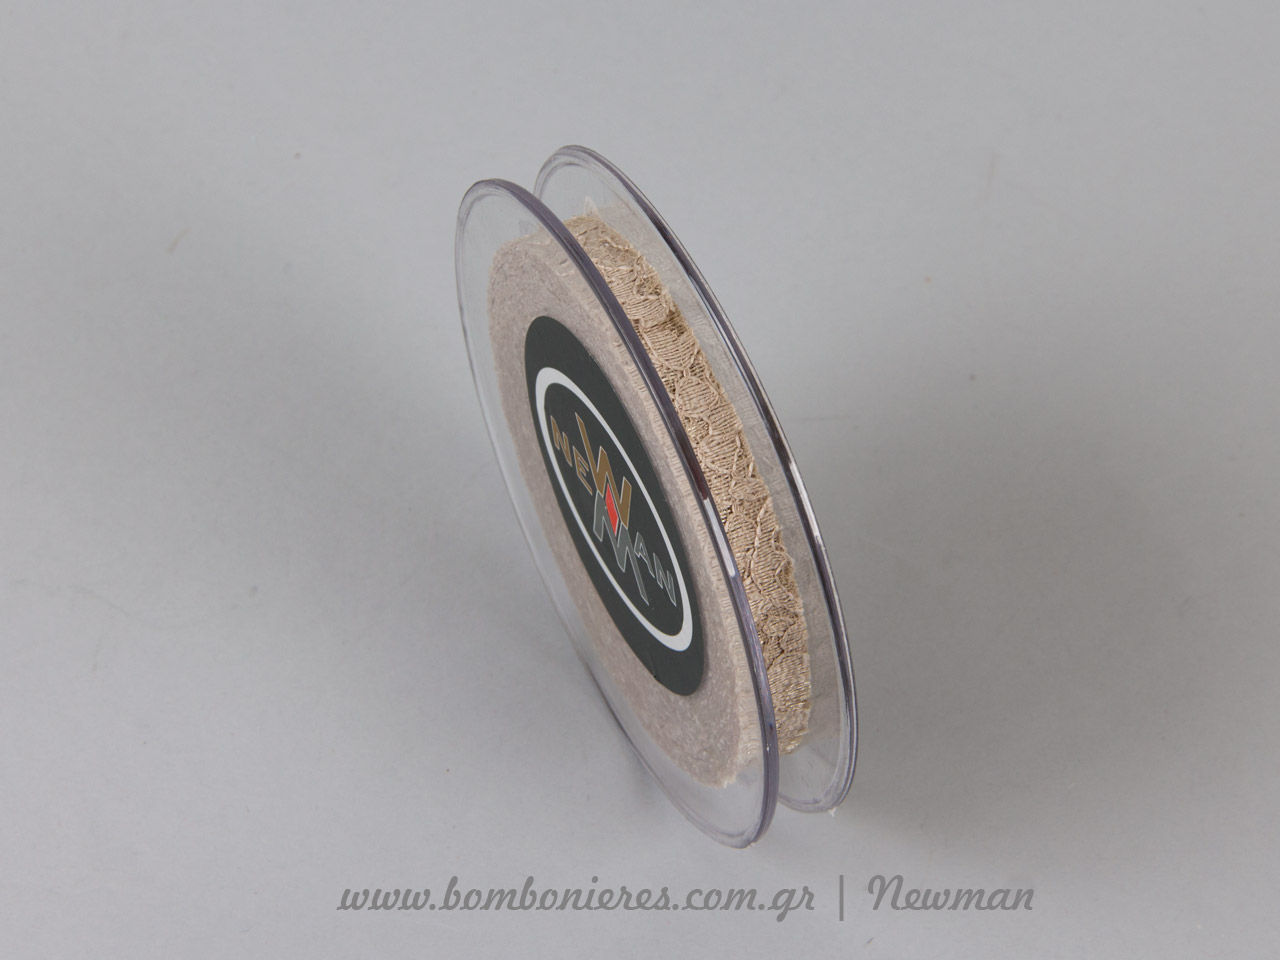 venezzia dantela 15mm 092062 δαντέλα μπεζ